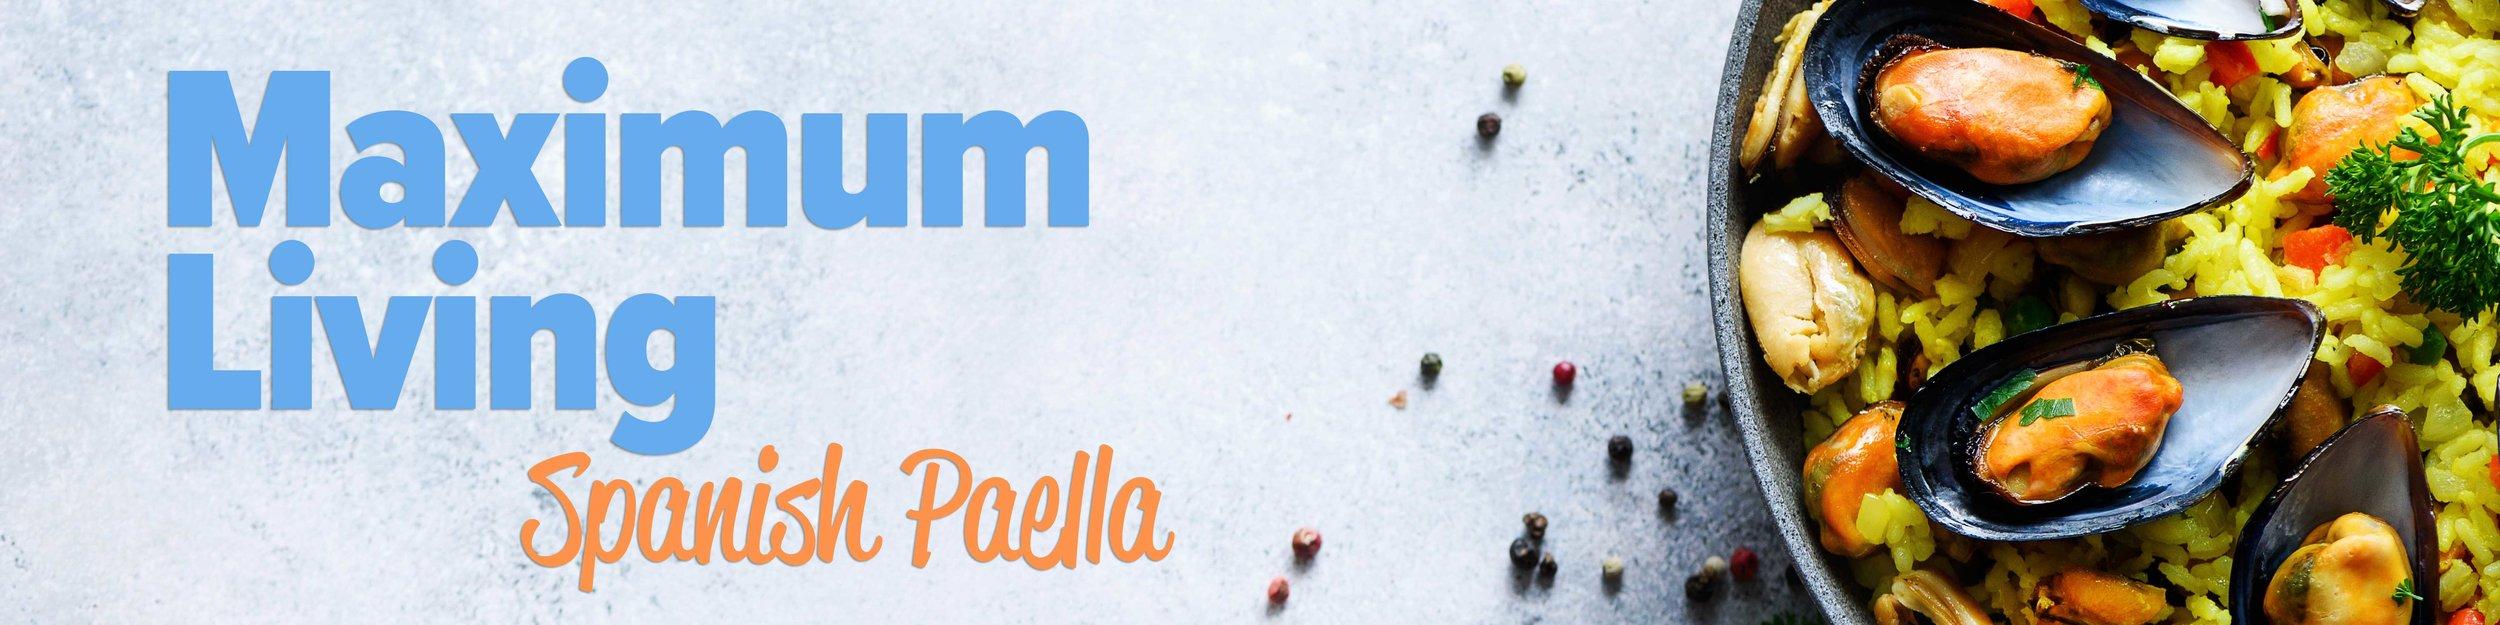 paella-banner_400x1600.jpg